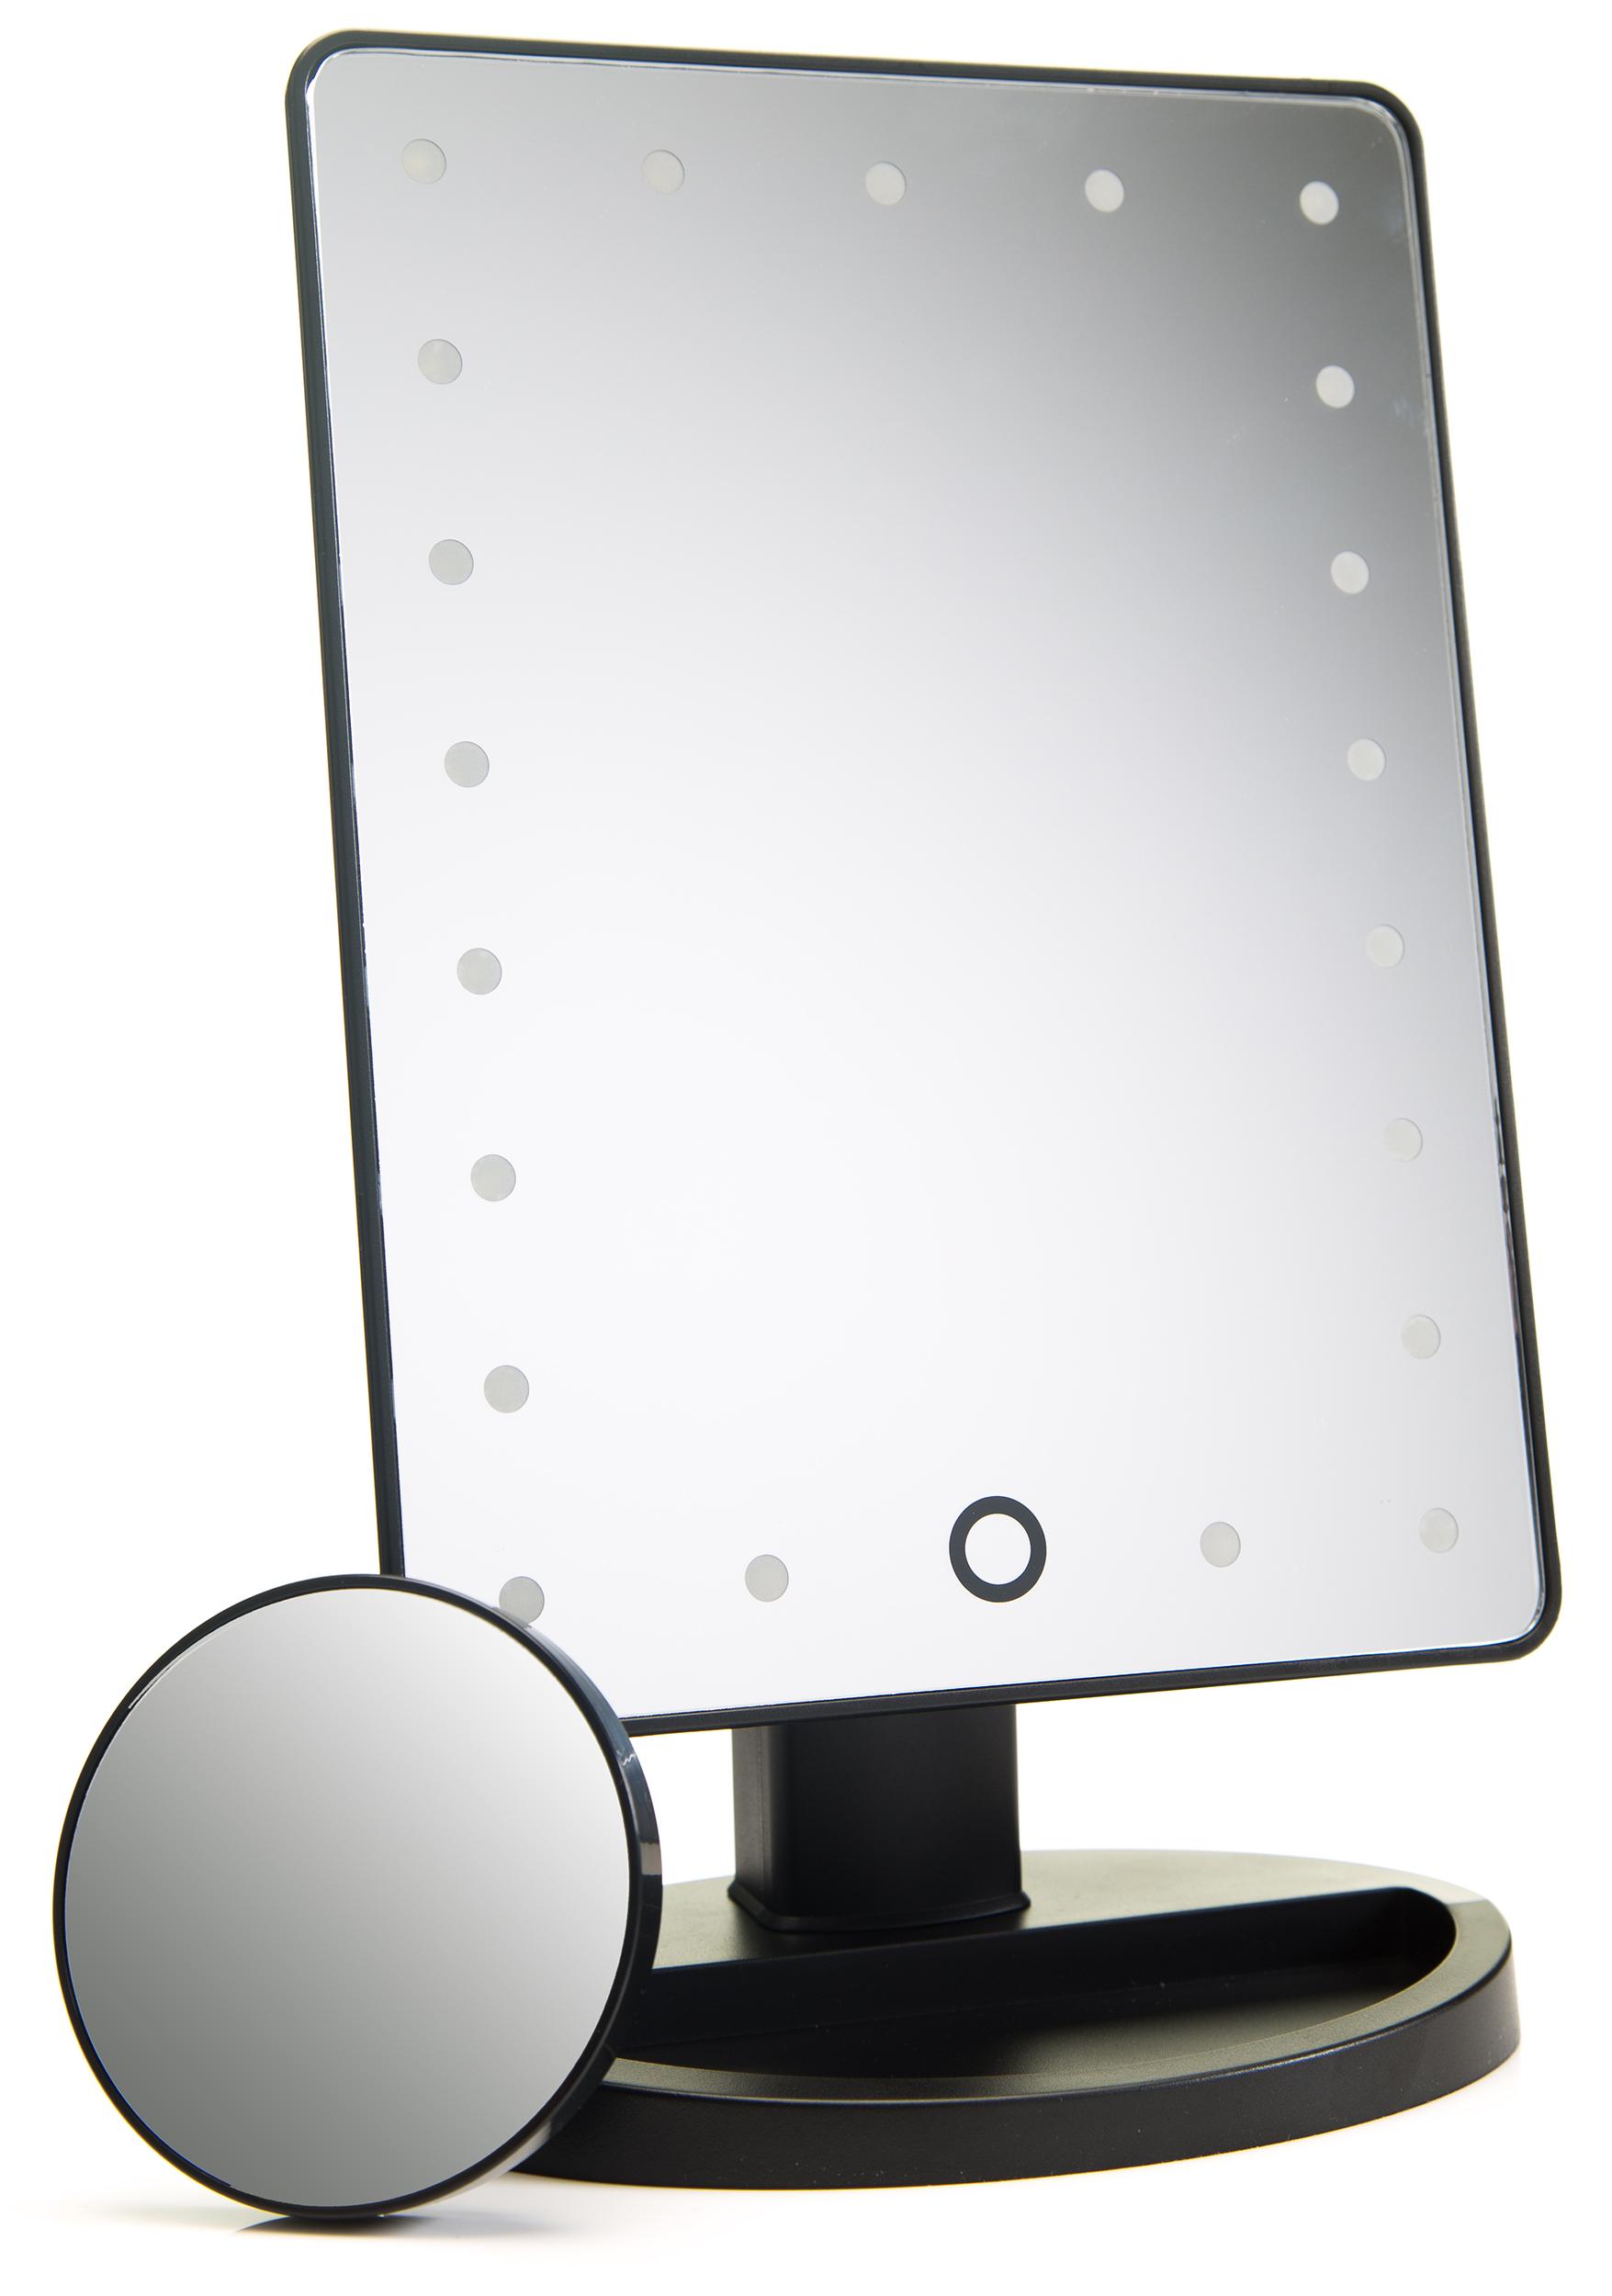 Make+Up+Mirror+With+Lights.jpg